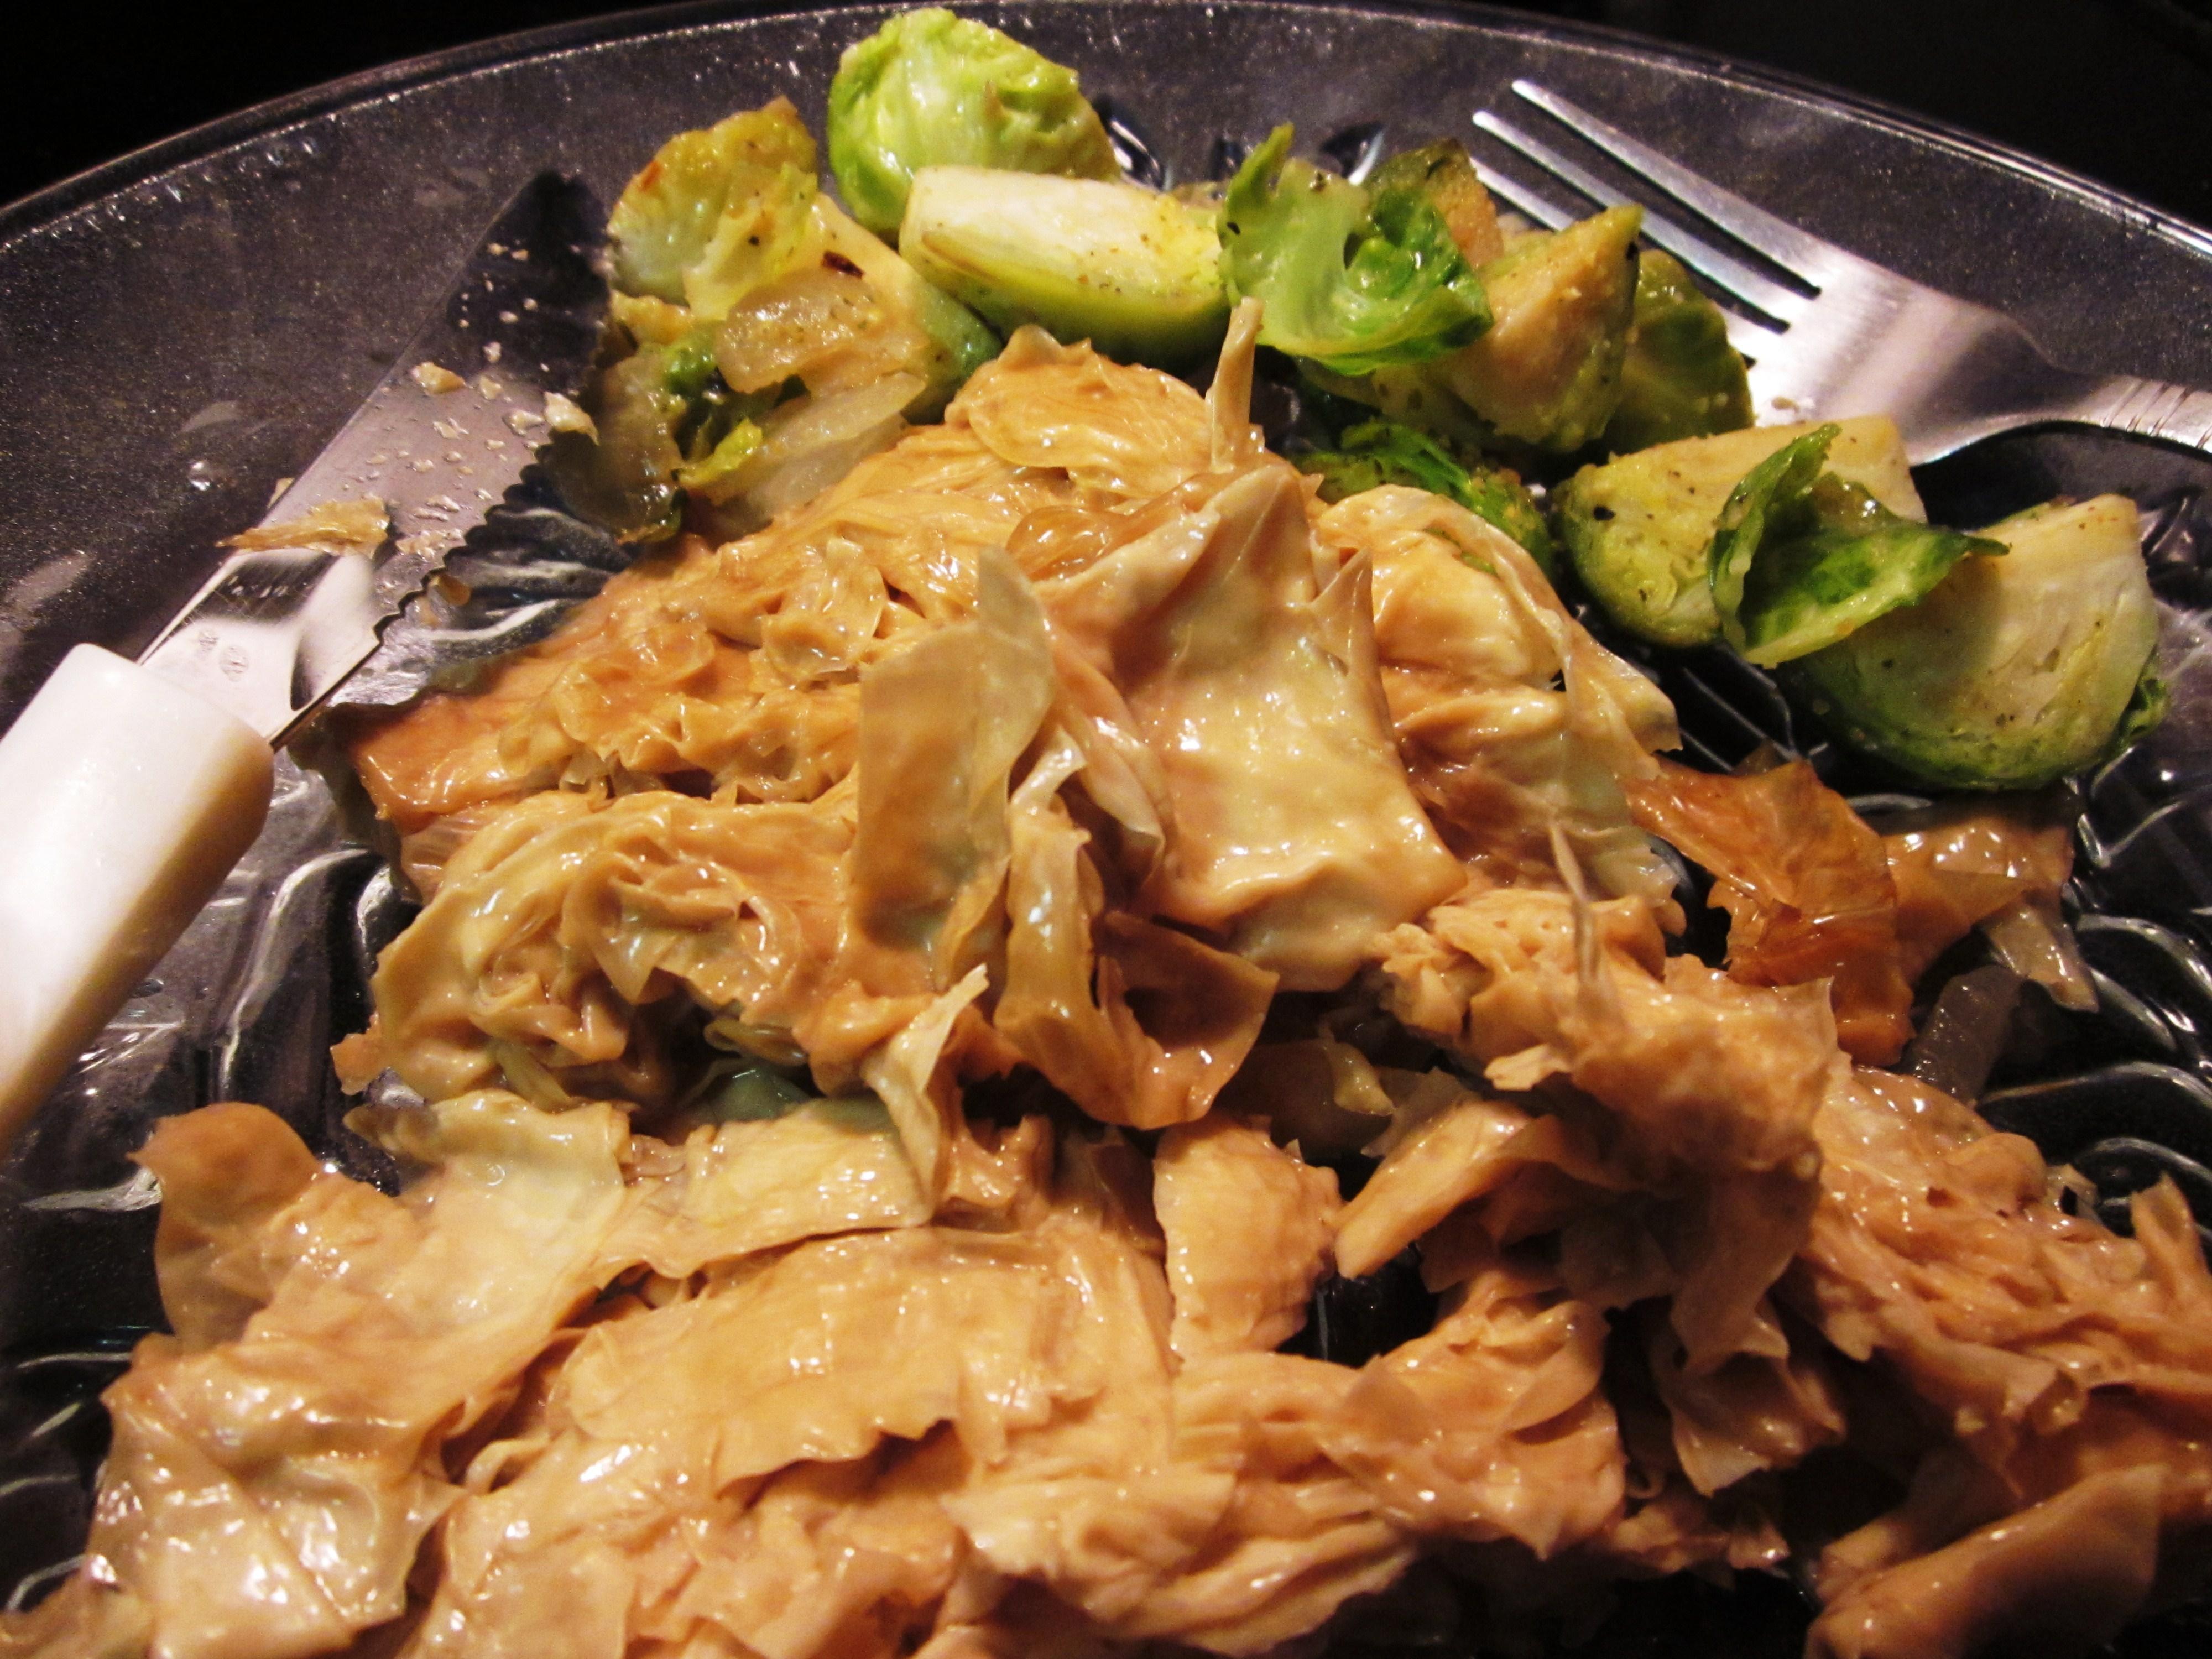 Asian mock meat recipes